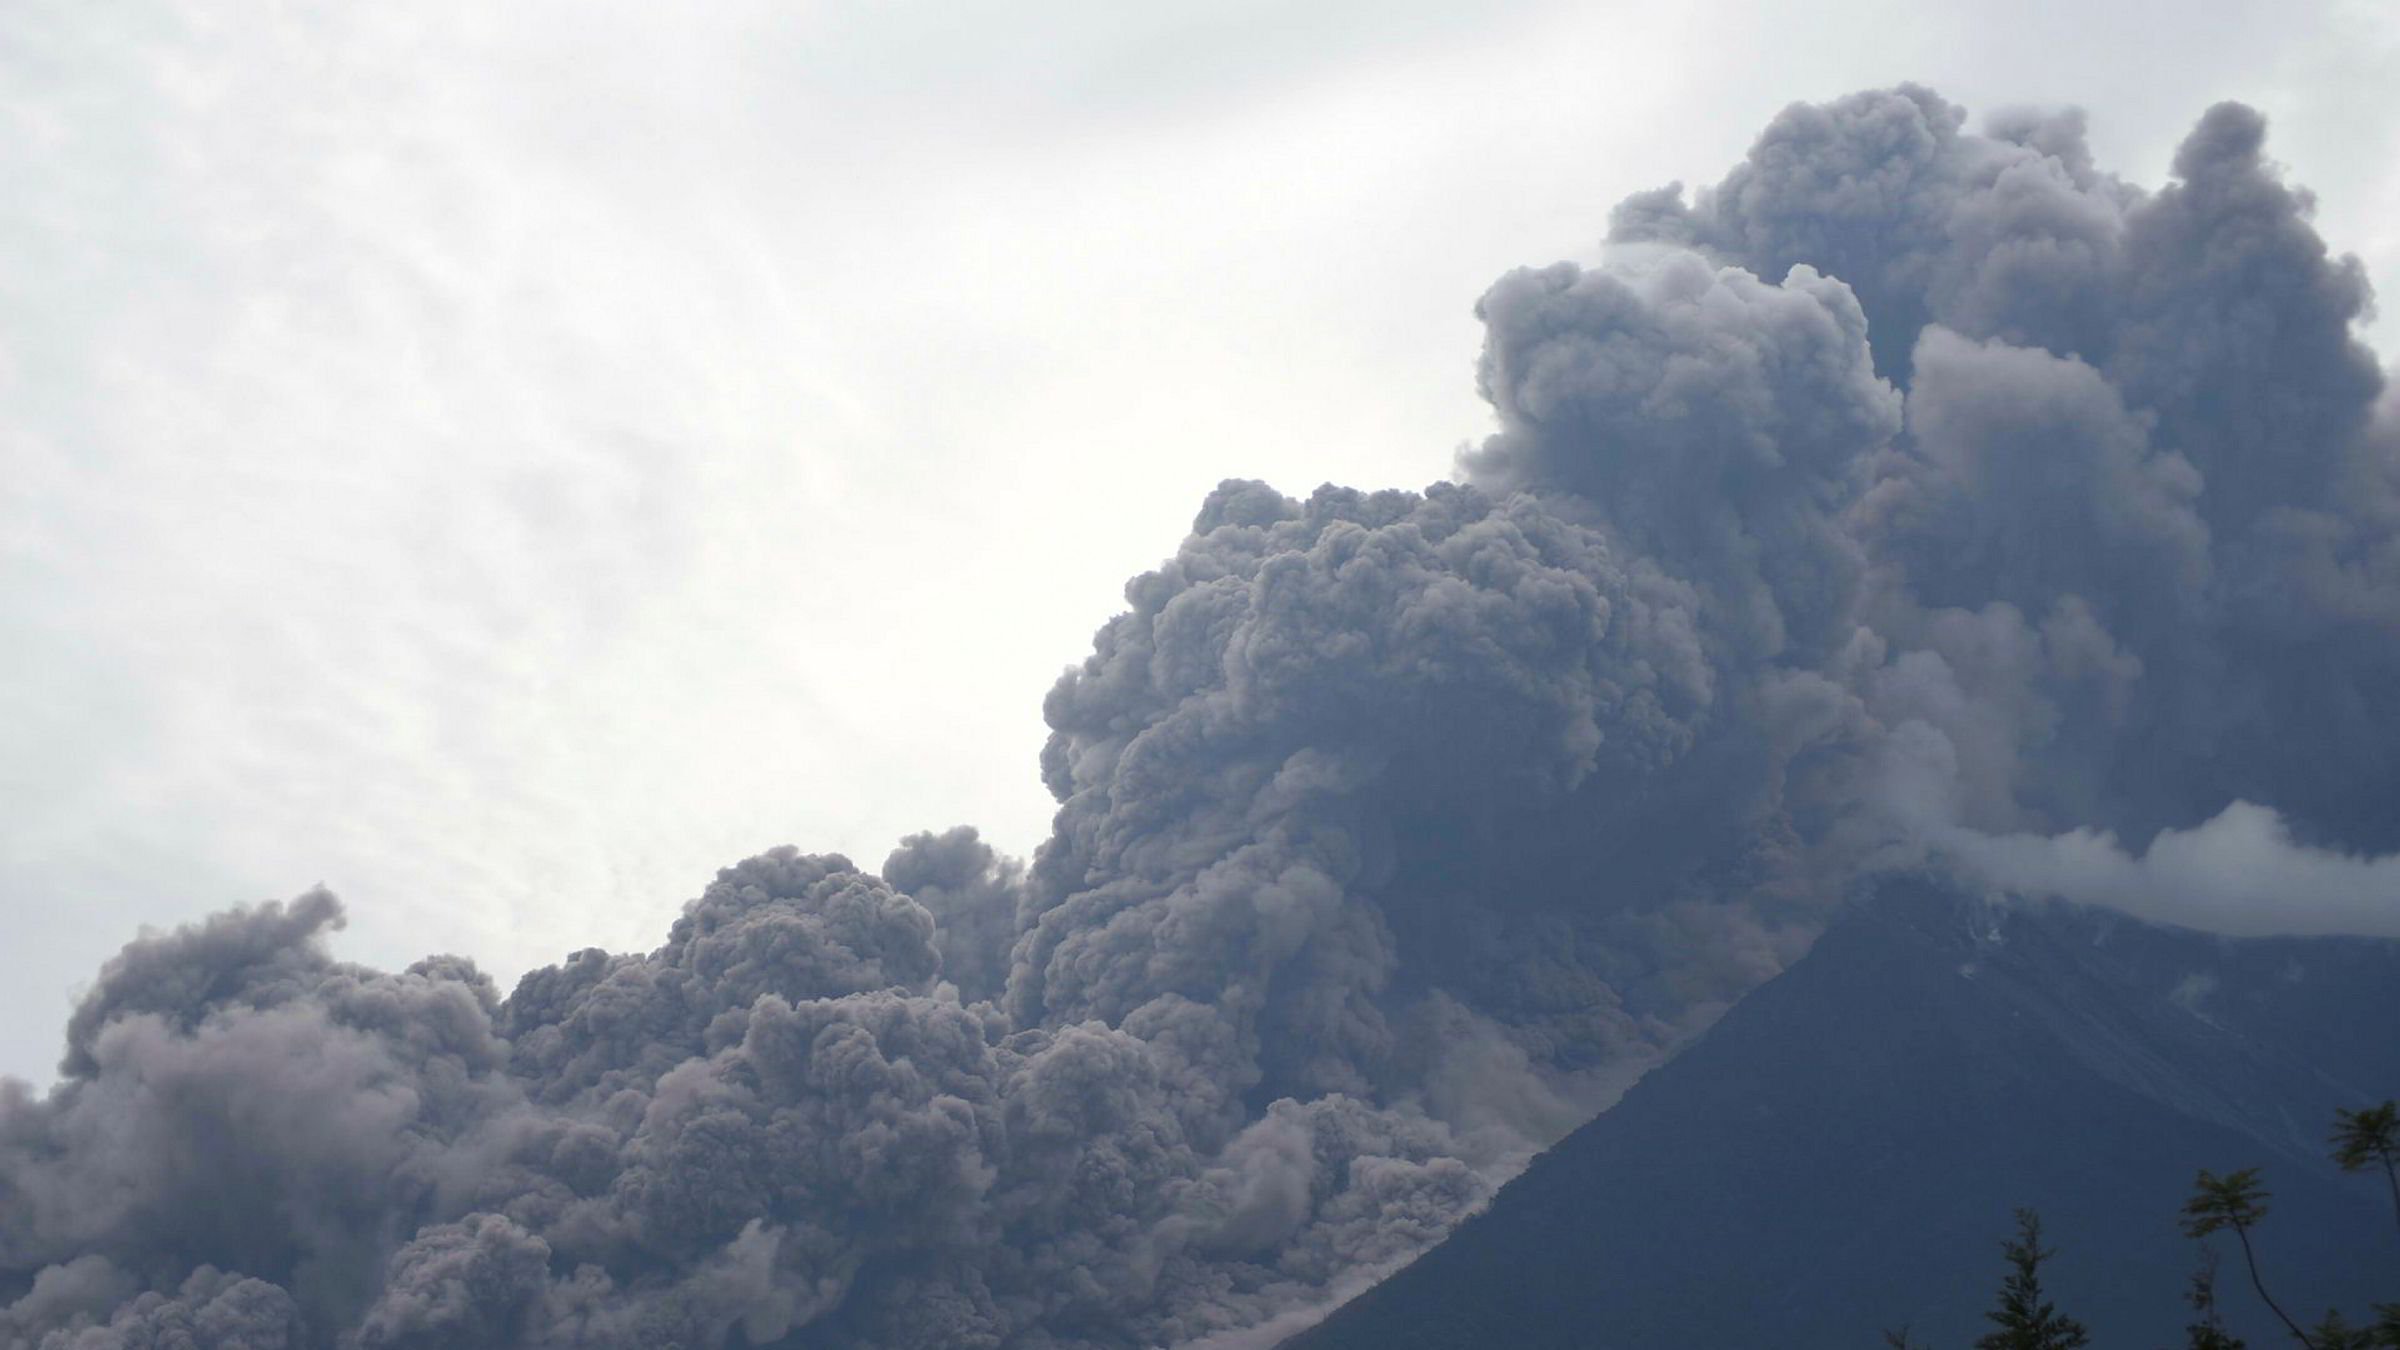 Utbruddet fra Vulkanen Fuego i Guatemala har gjort stor skade.